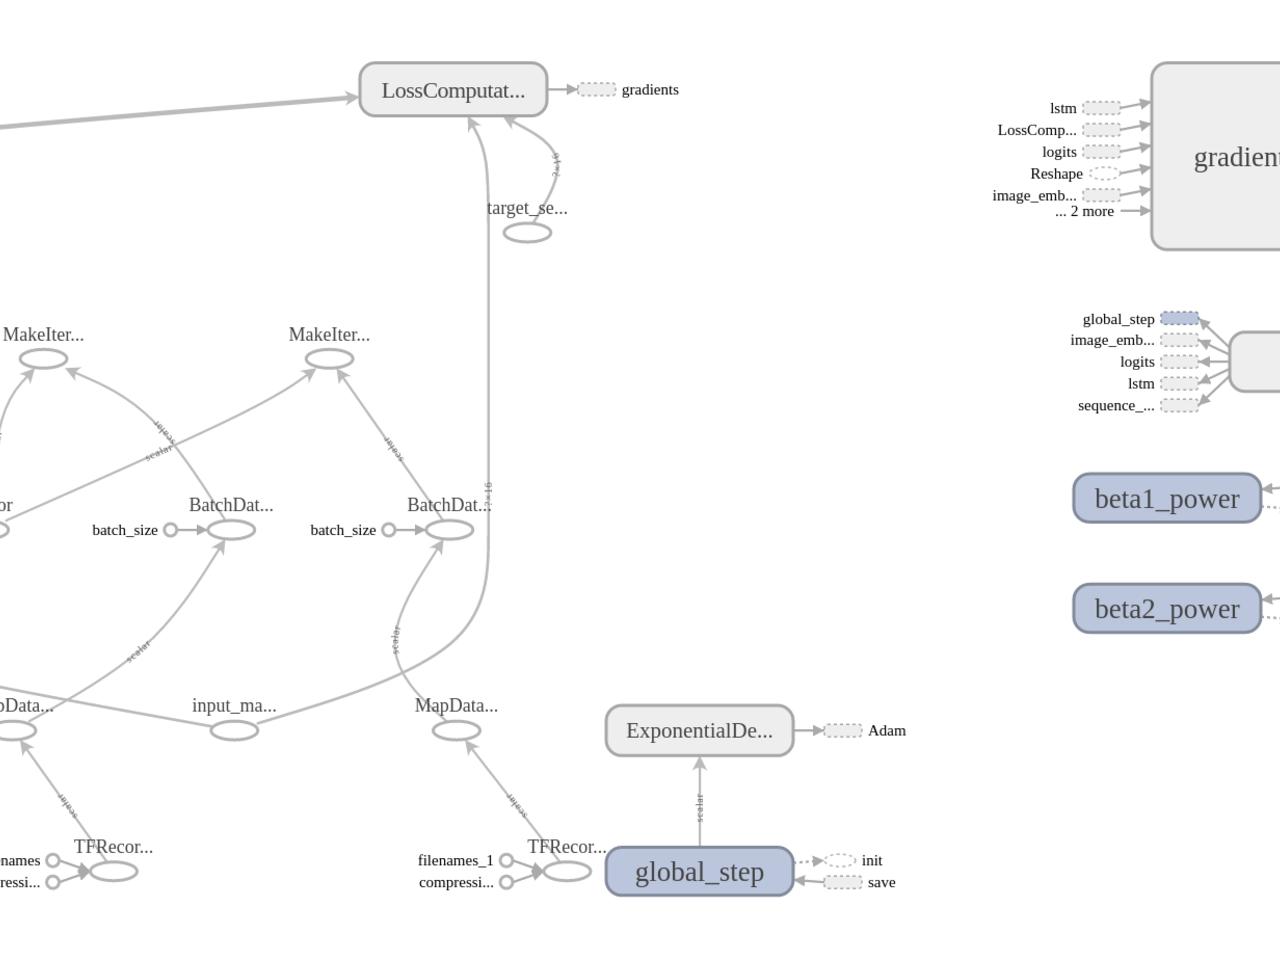 Neural Image Captioning System